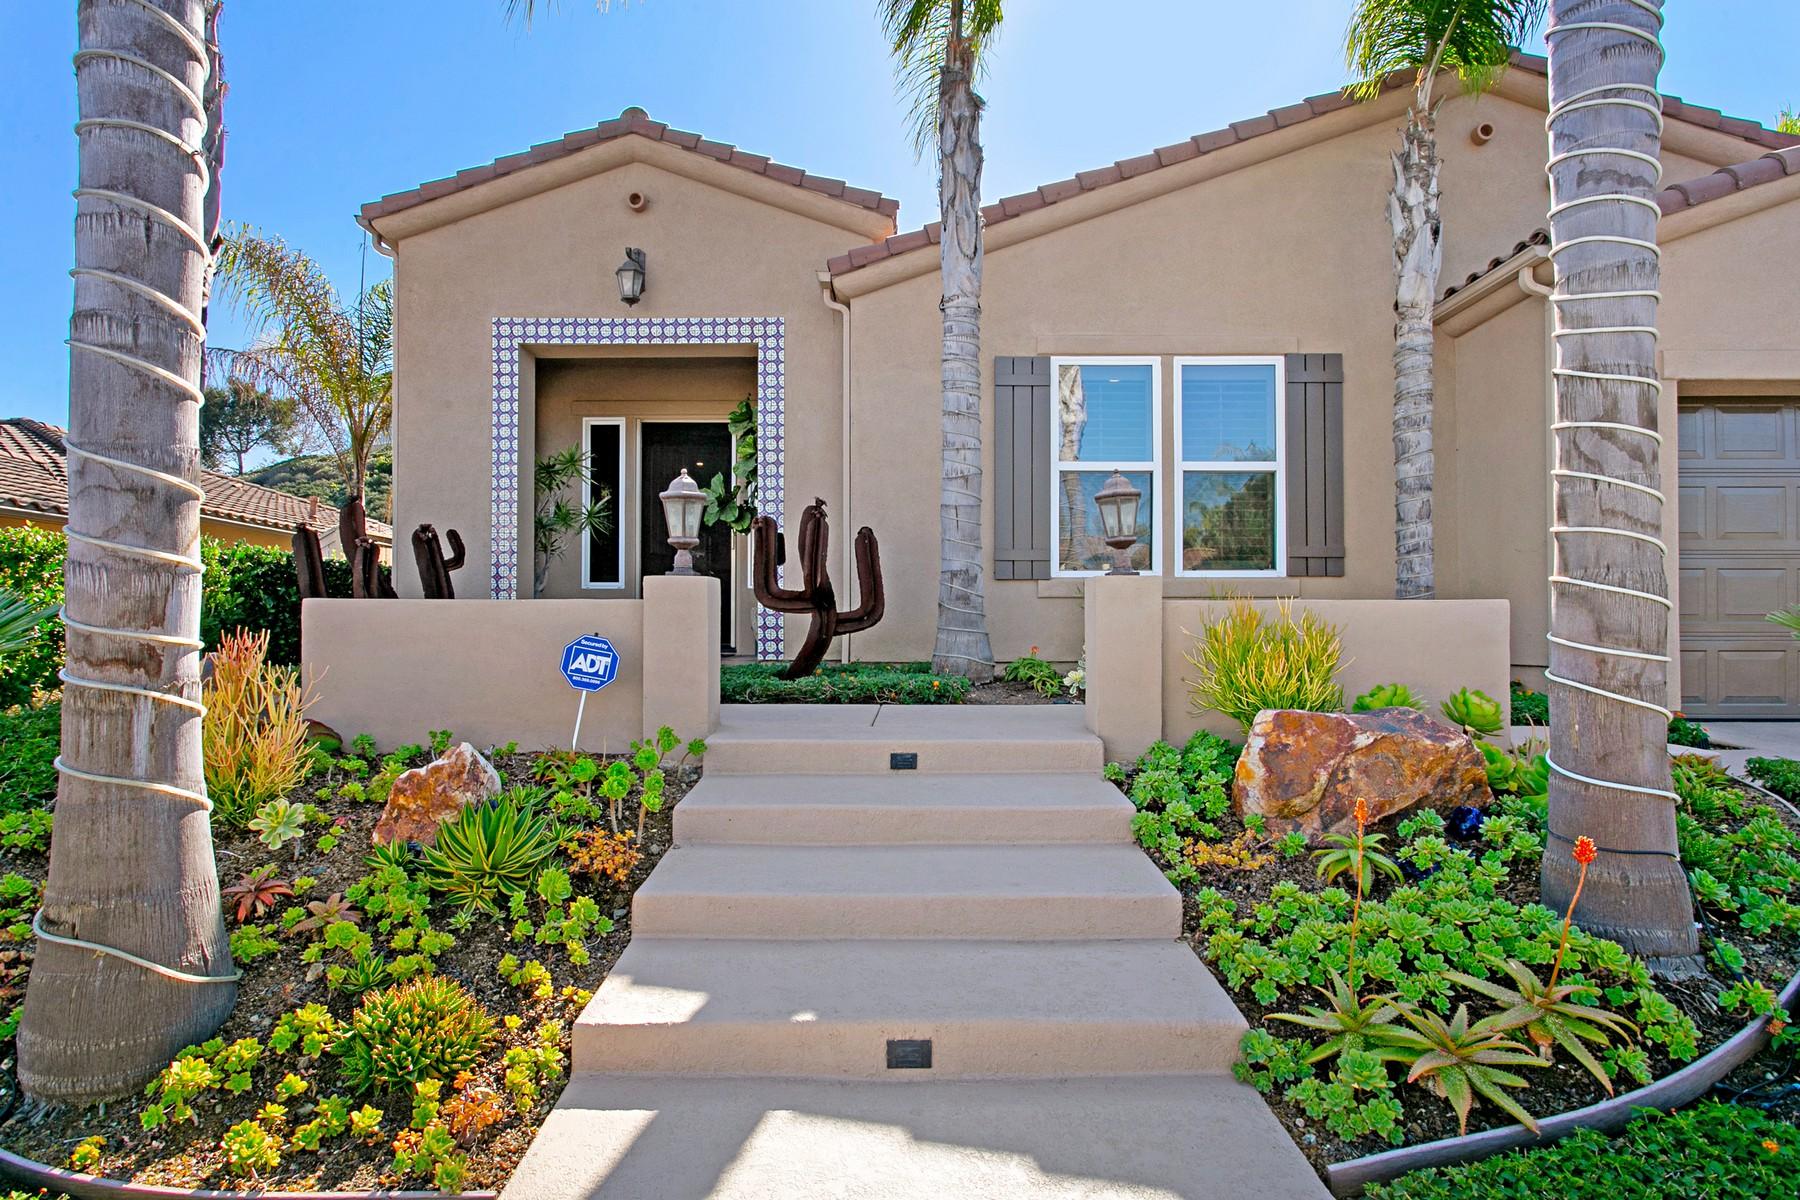 Single Family Homes for Sale at 1743 Cuadro Vista San Marcos, California 92078 United States